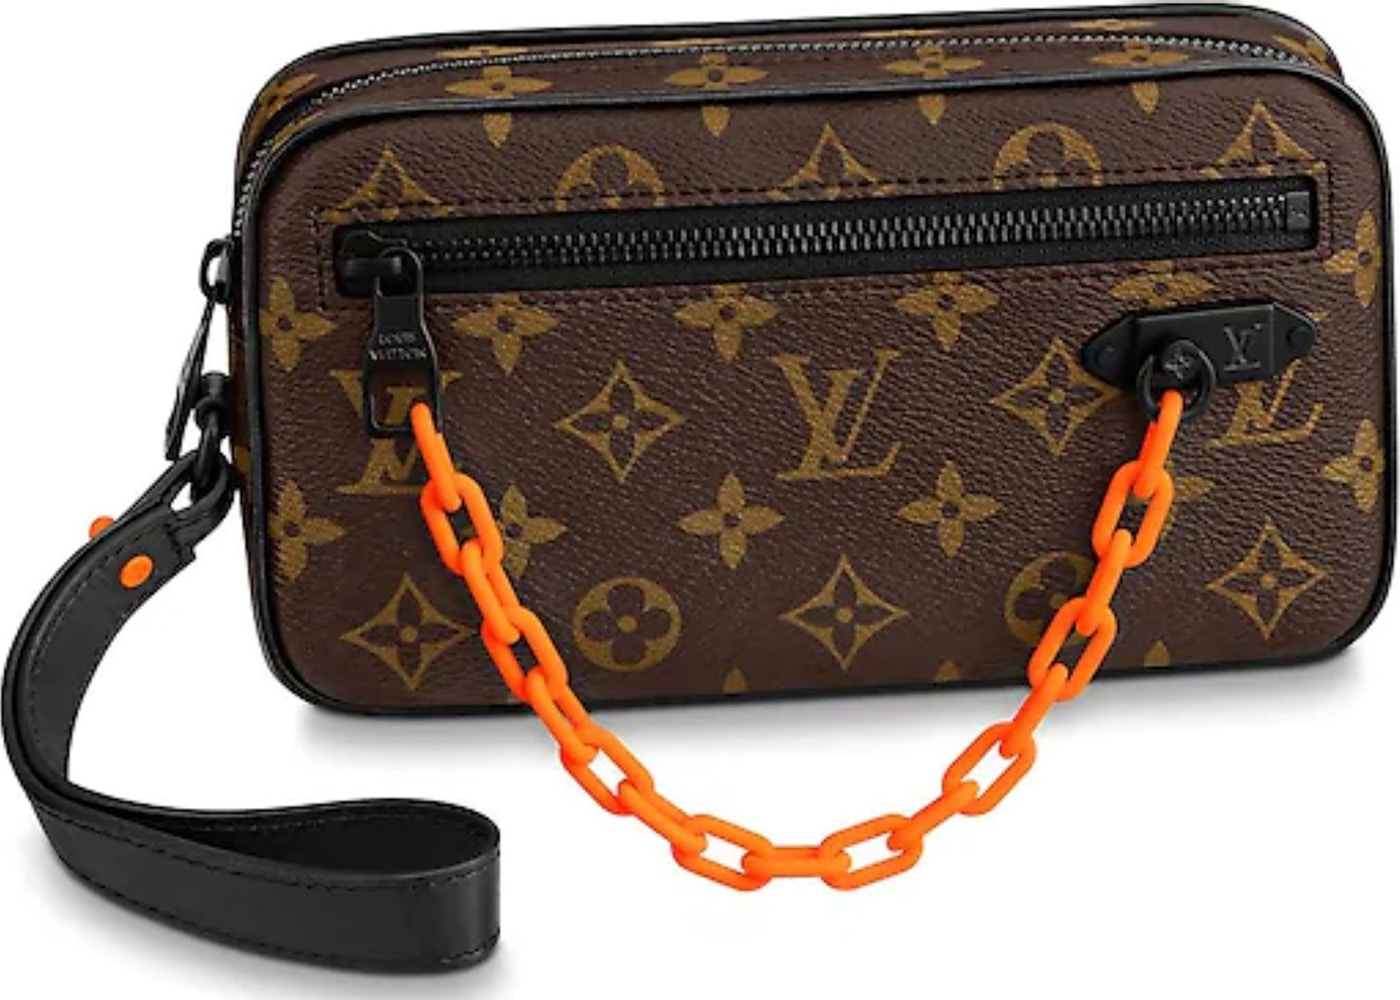 77ede7878de4 Louis Vuitton Pochette Volga Monogram Brown. Monogram Brown